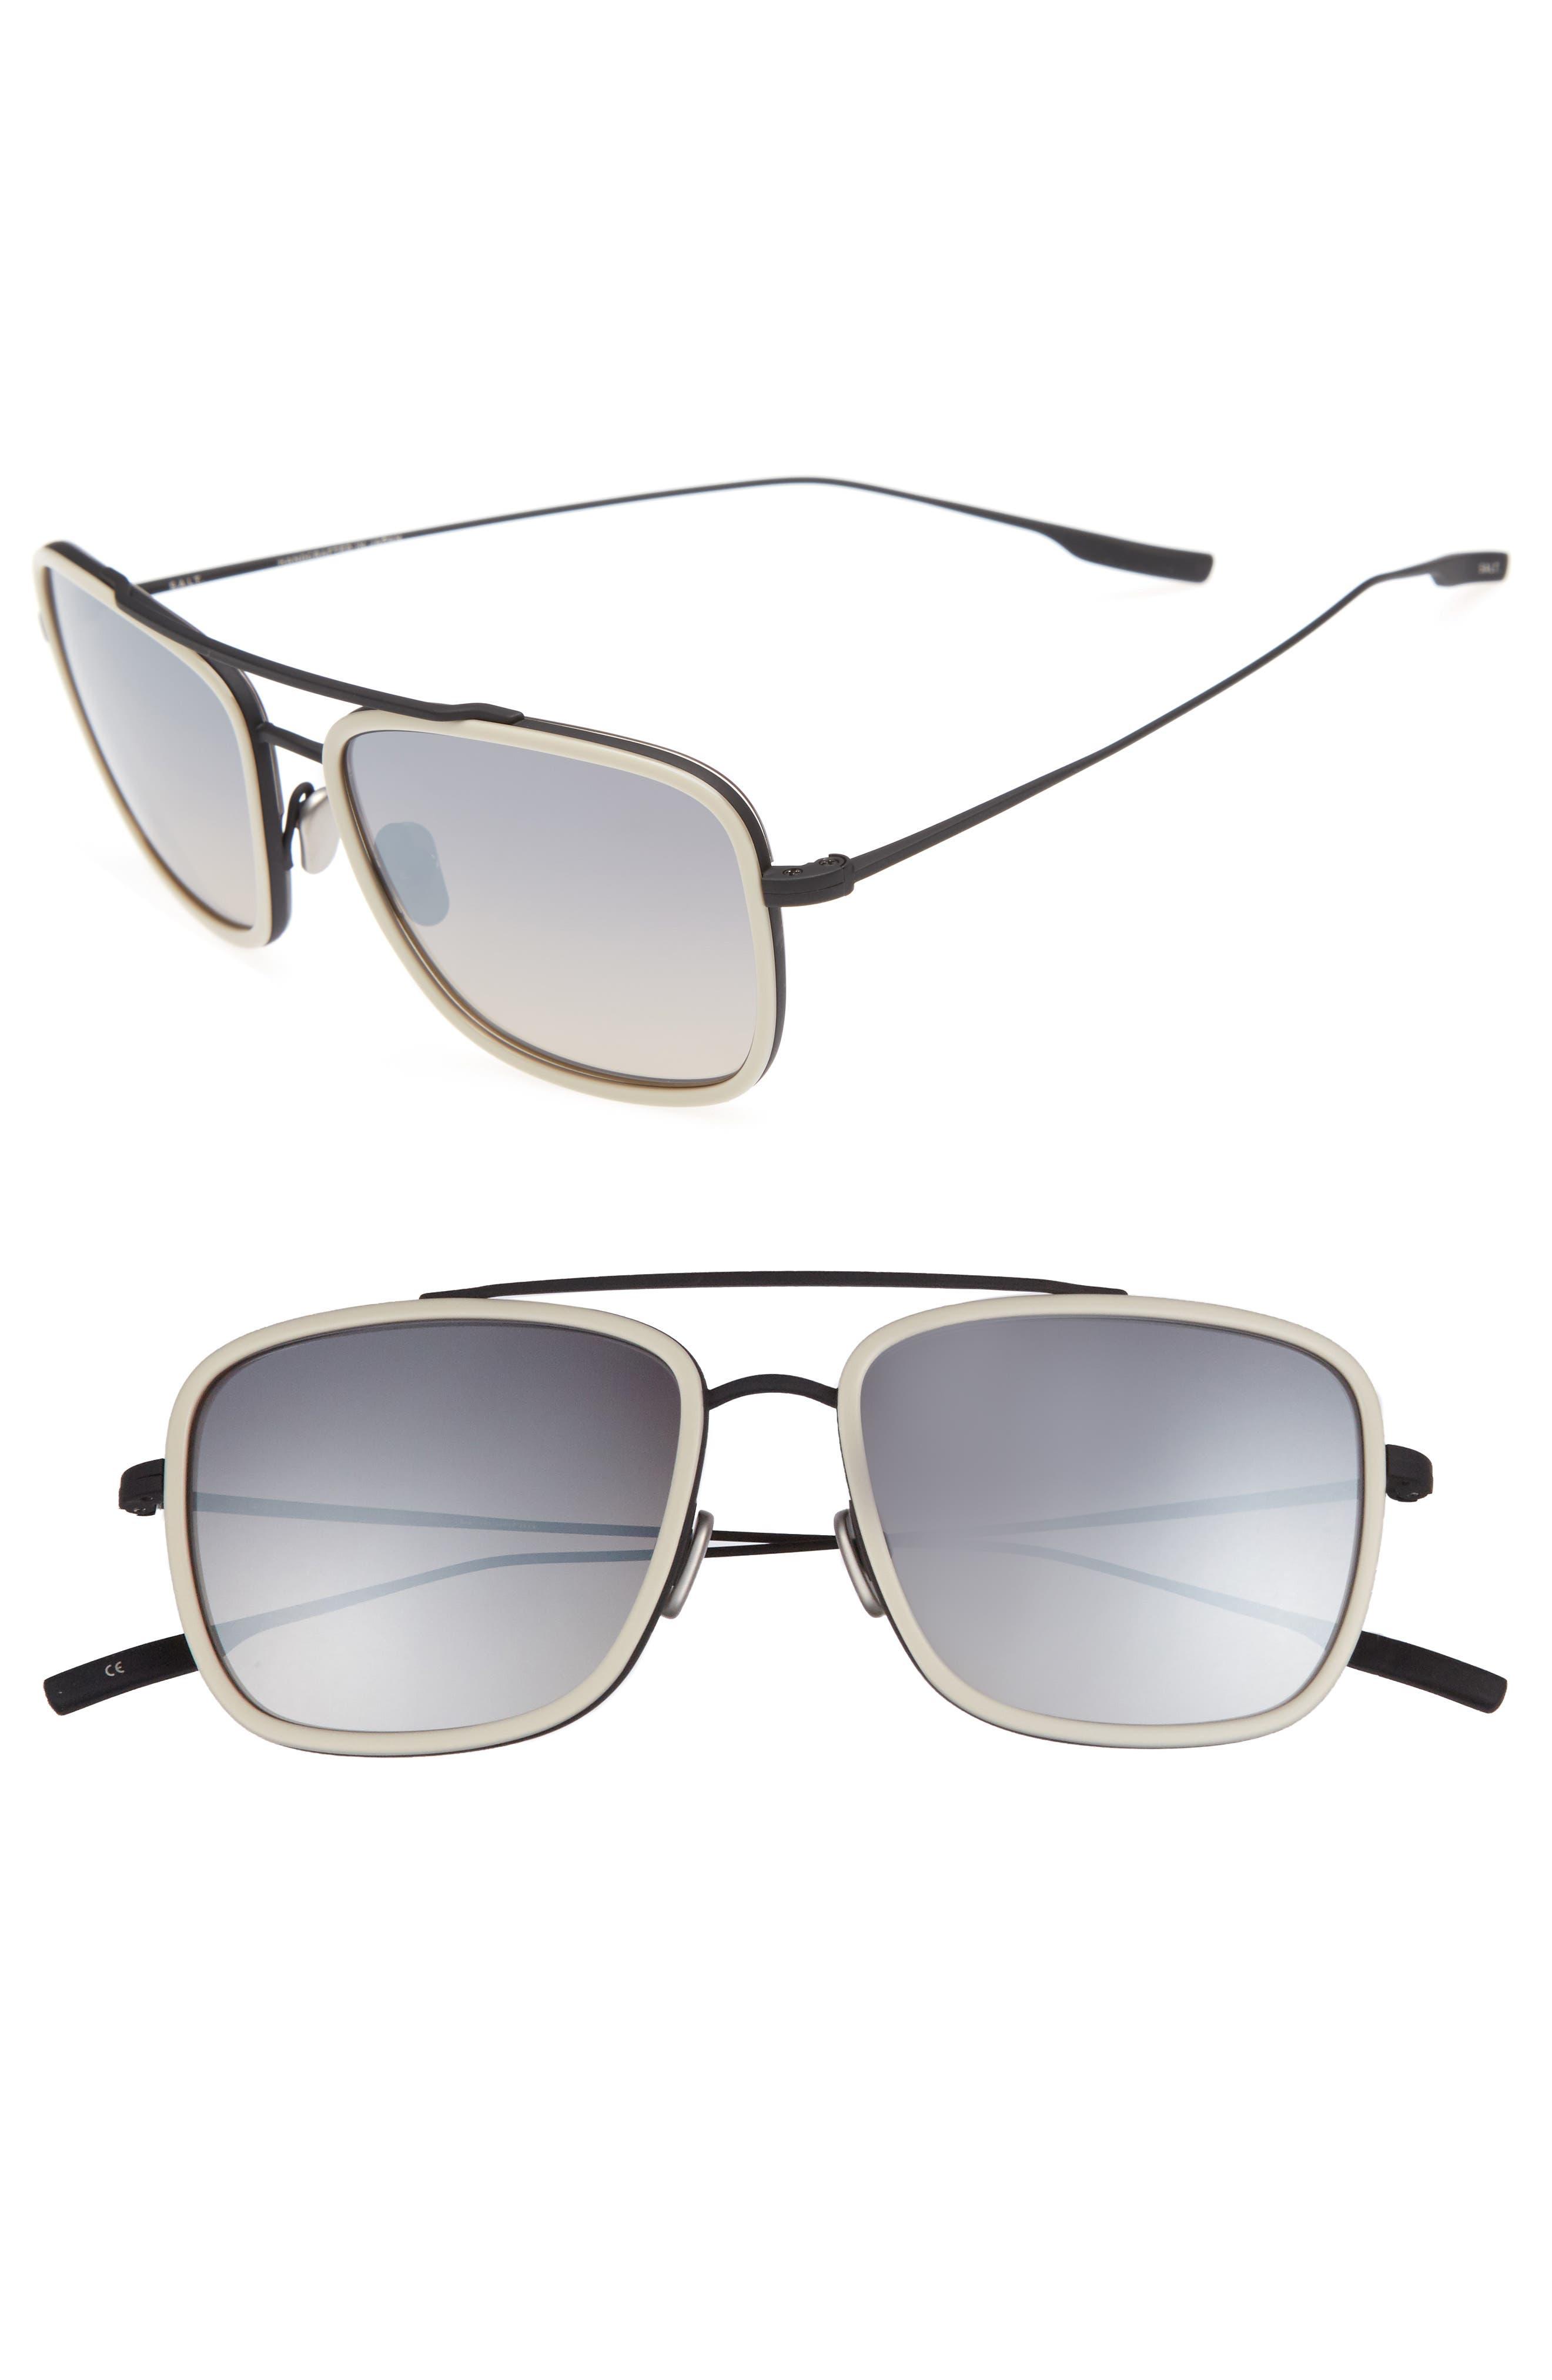 Harrison 54mm Polarized Sunglasses,                             Main thumbnail 1, color,                             011